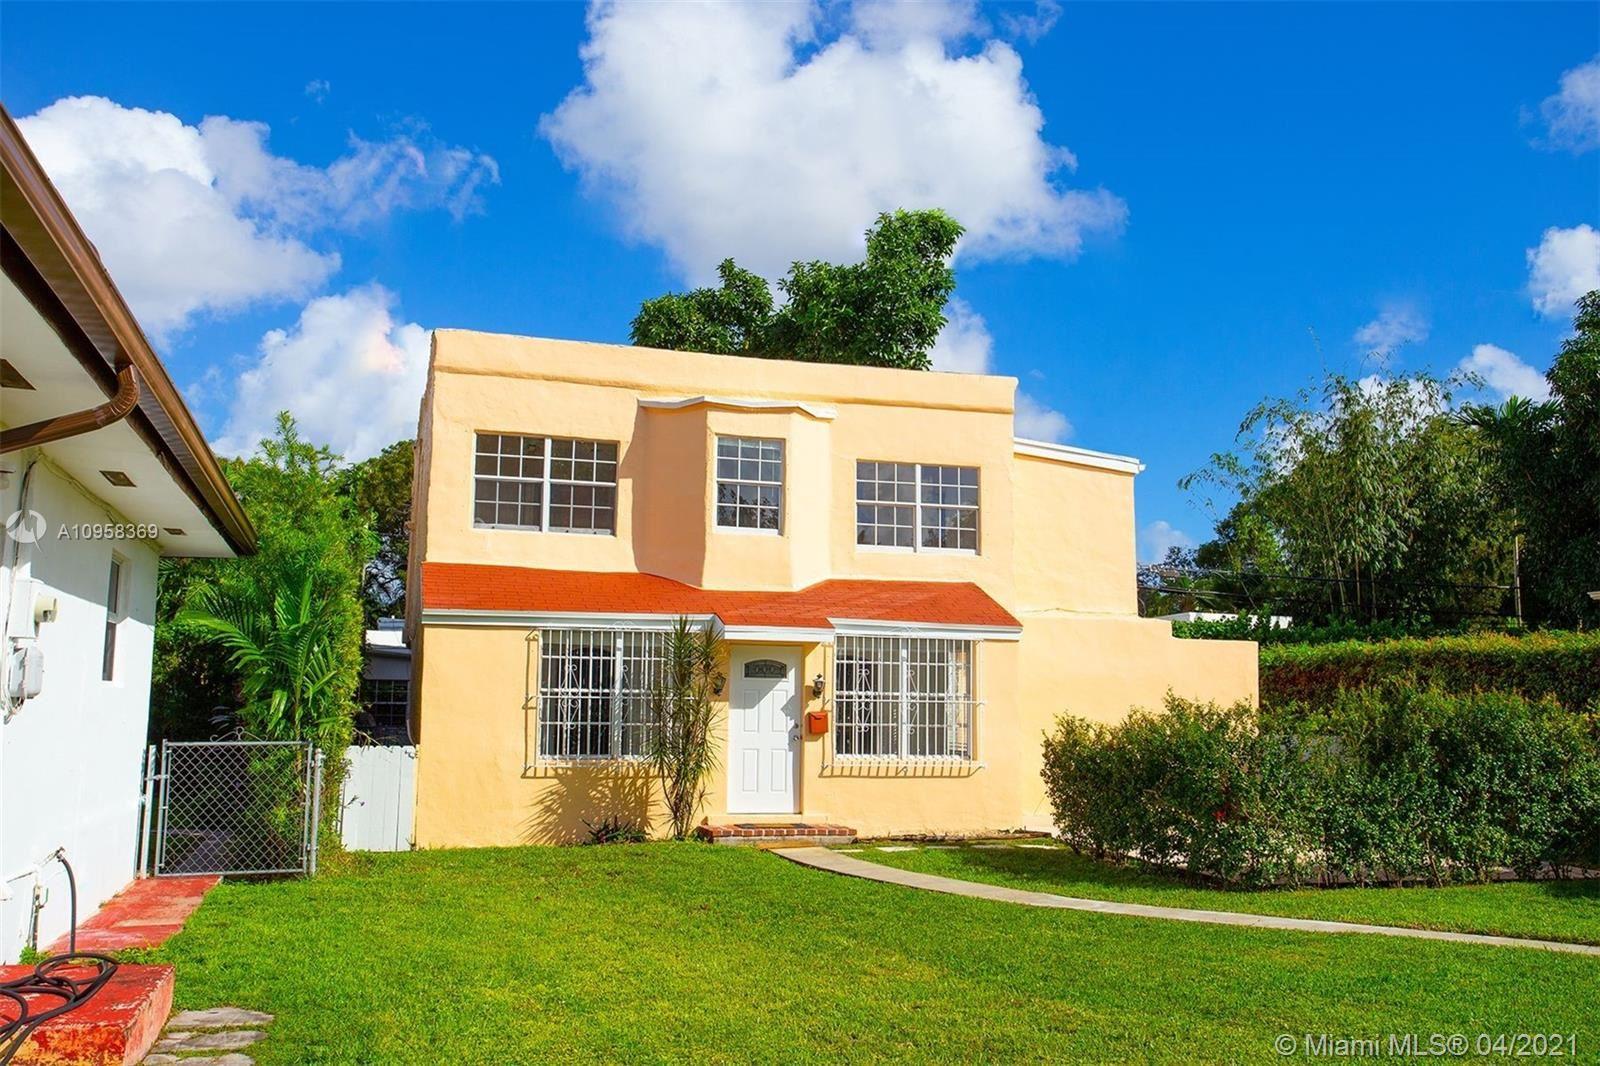 837 El Rado St, Coral Gables, FL 33134 - #: A10958369